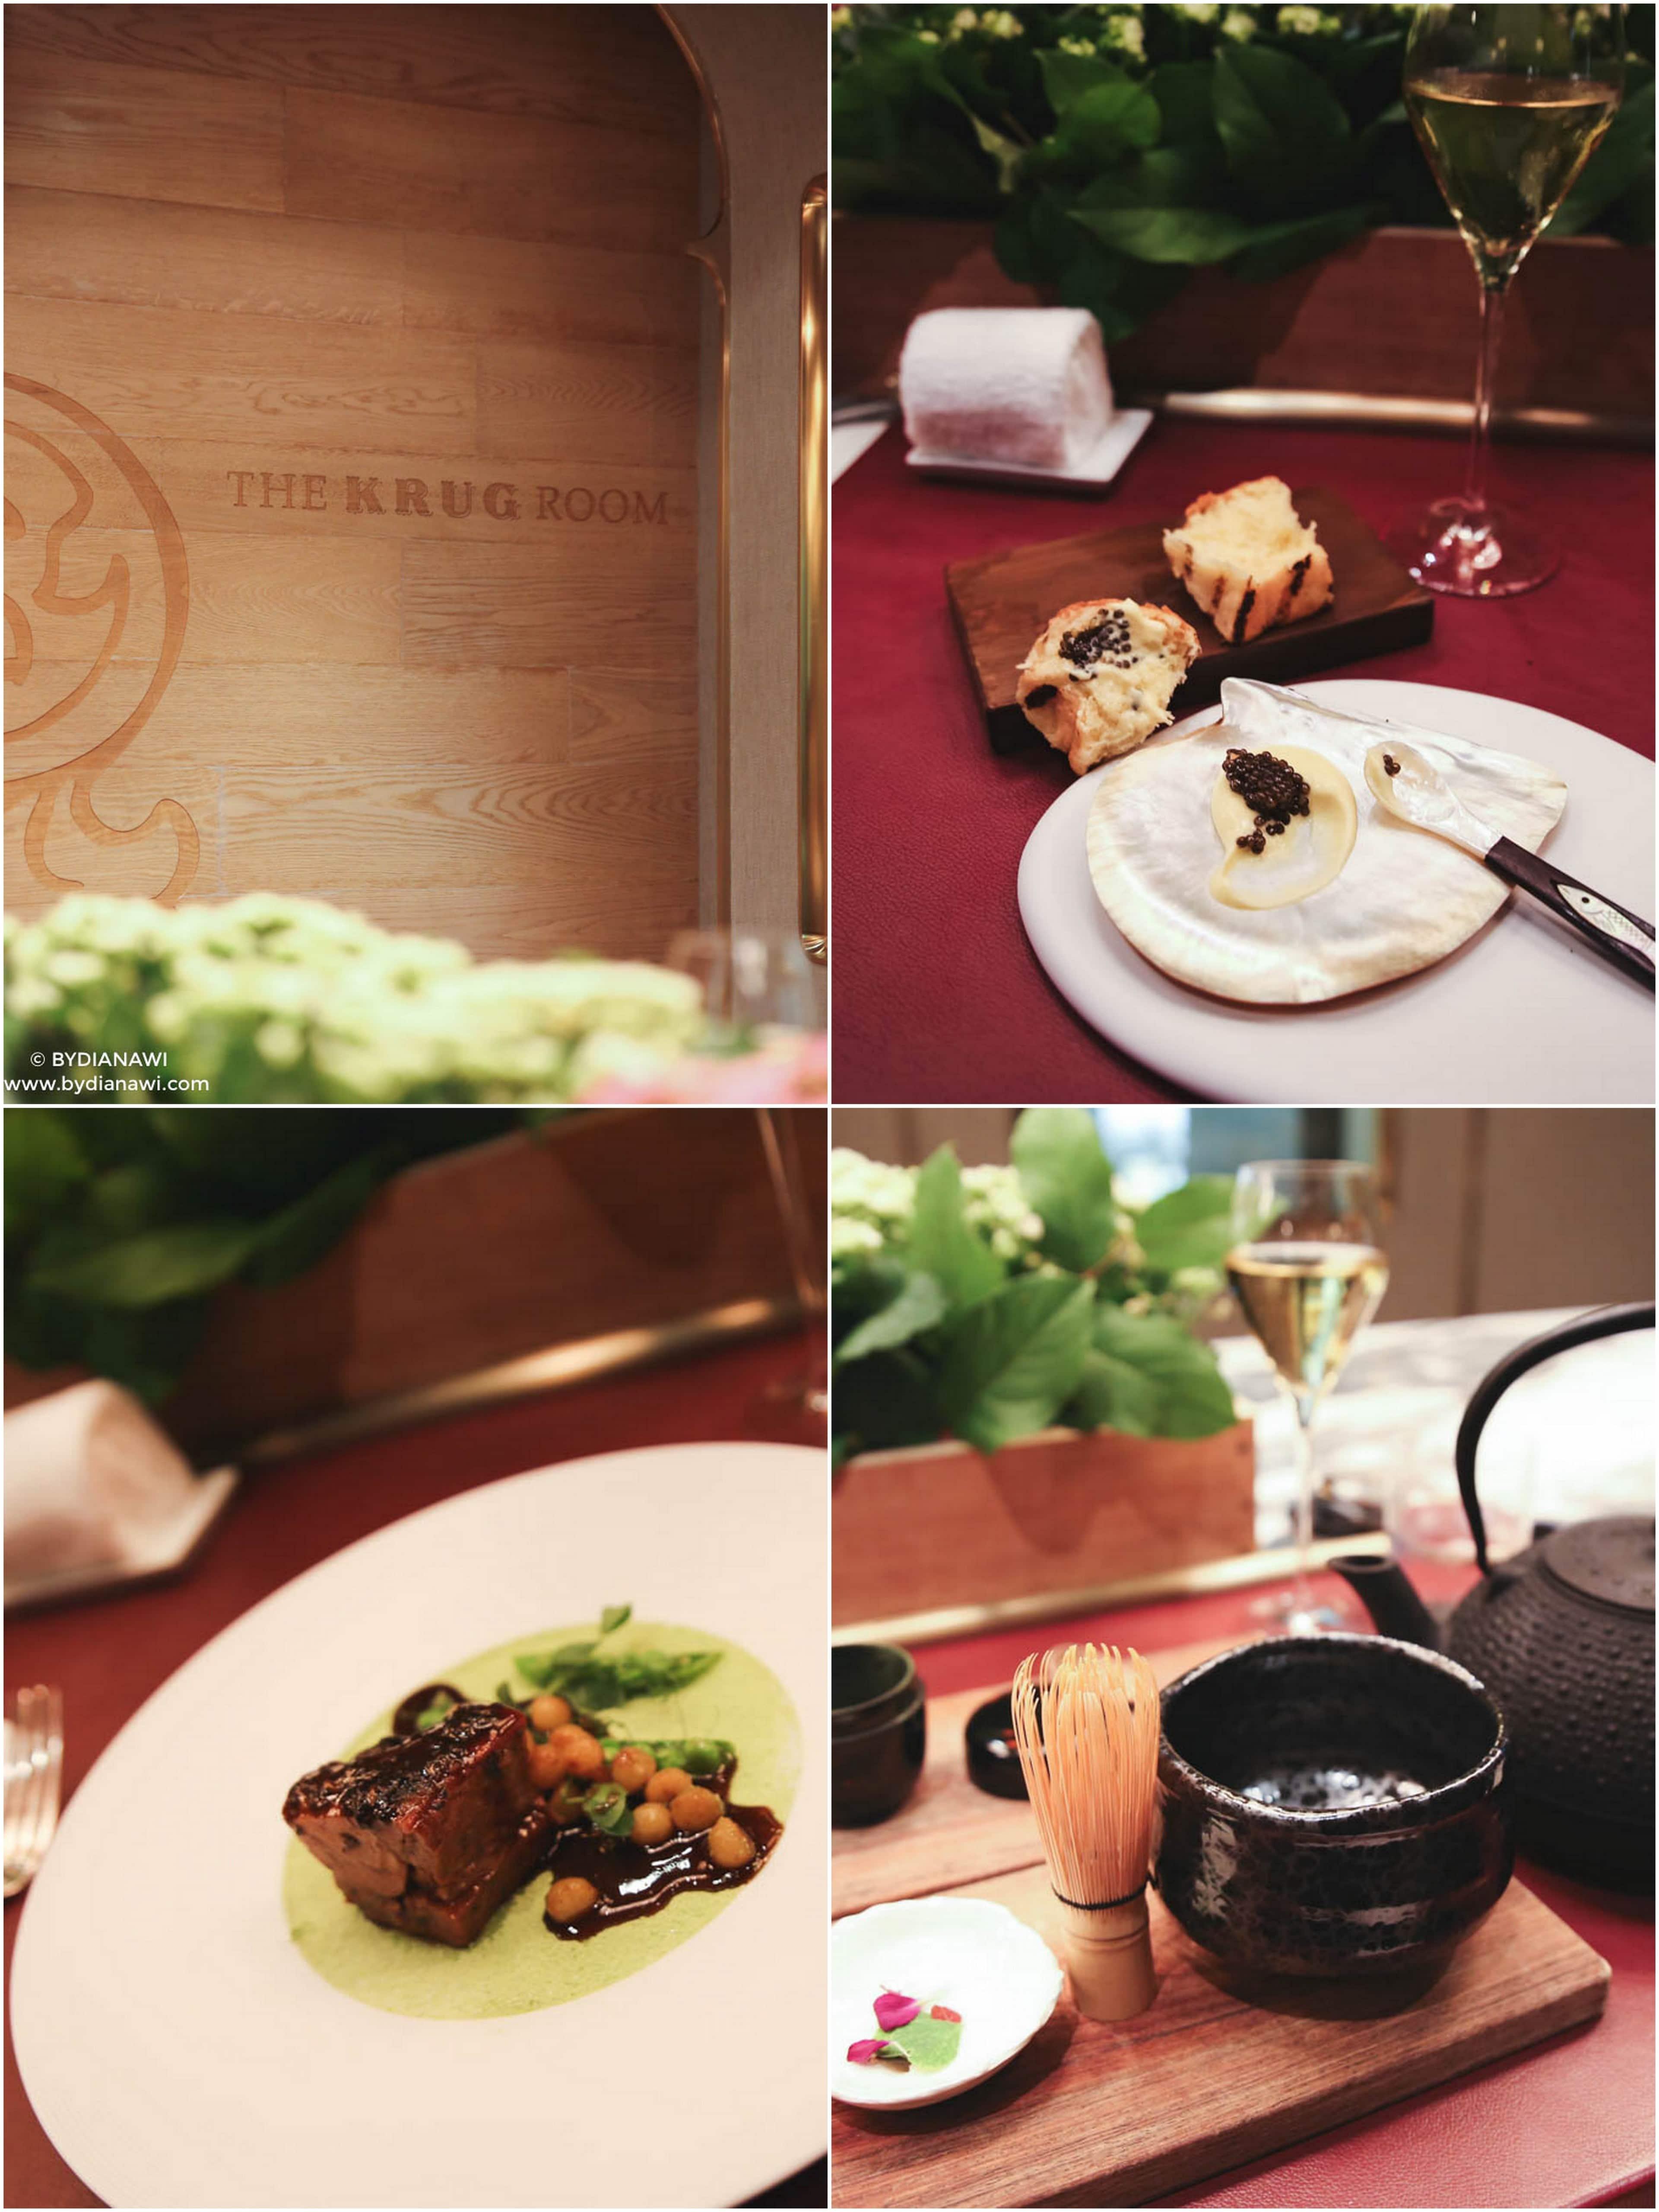 Krug room Mandarin Oriental hotel Hong Kong